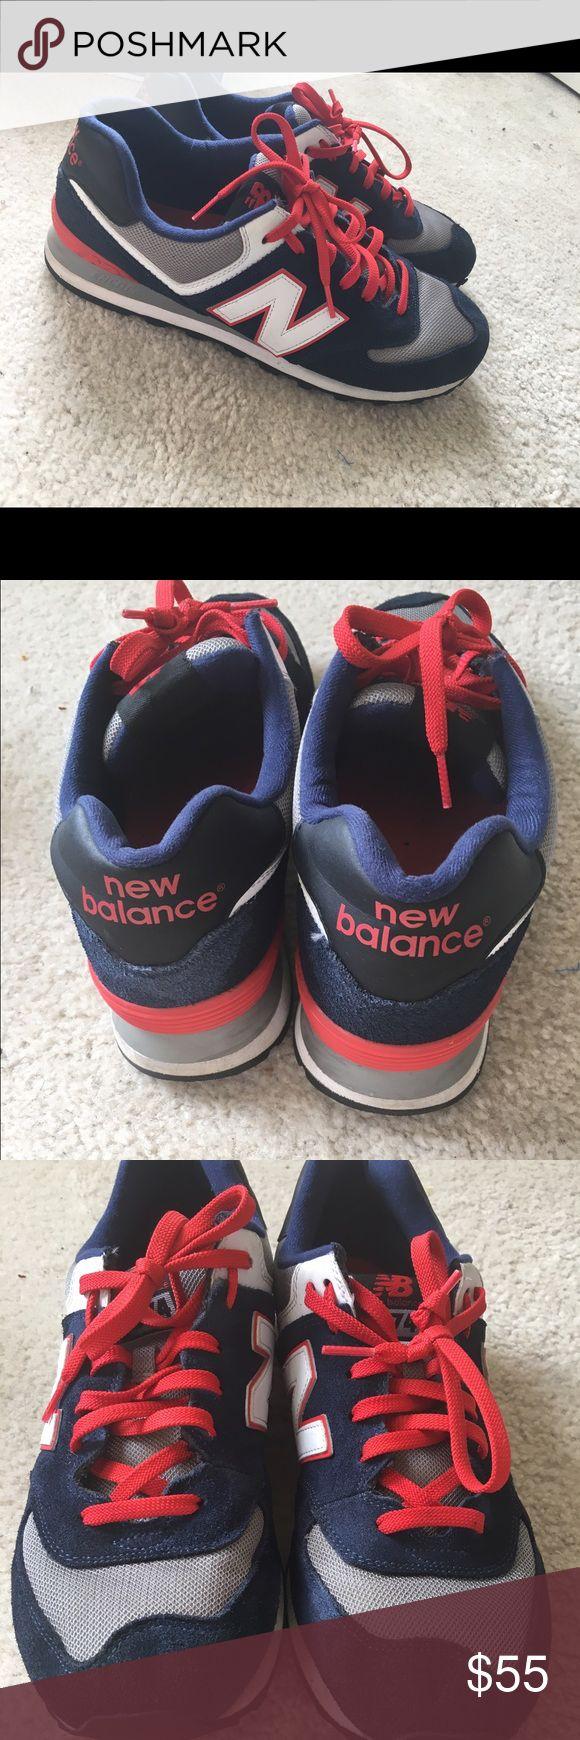 mens new balance minimus size 11